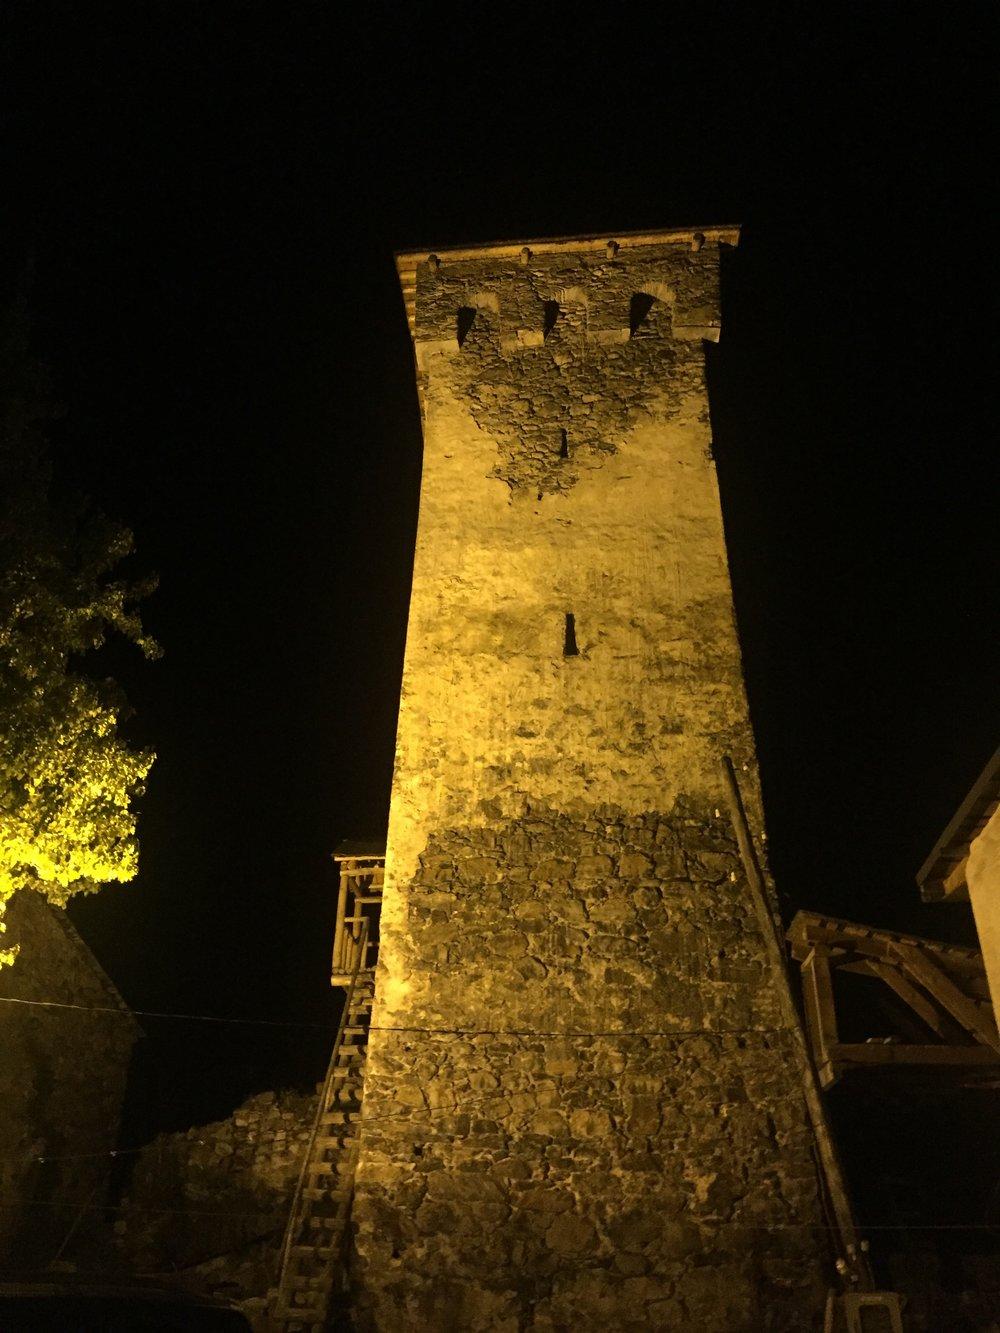 Svan tower at night